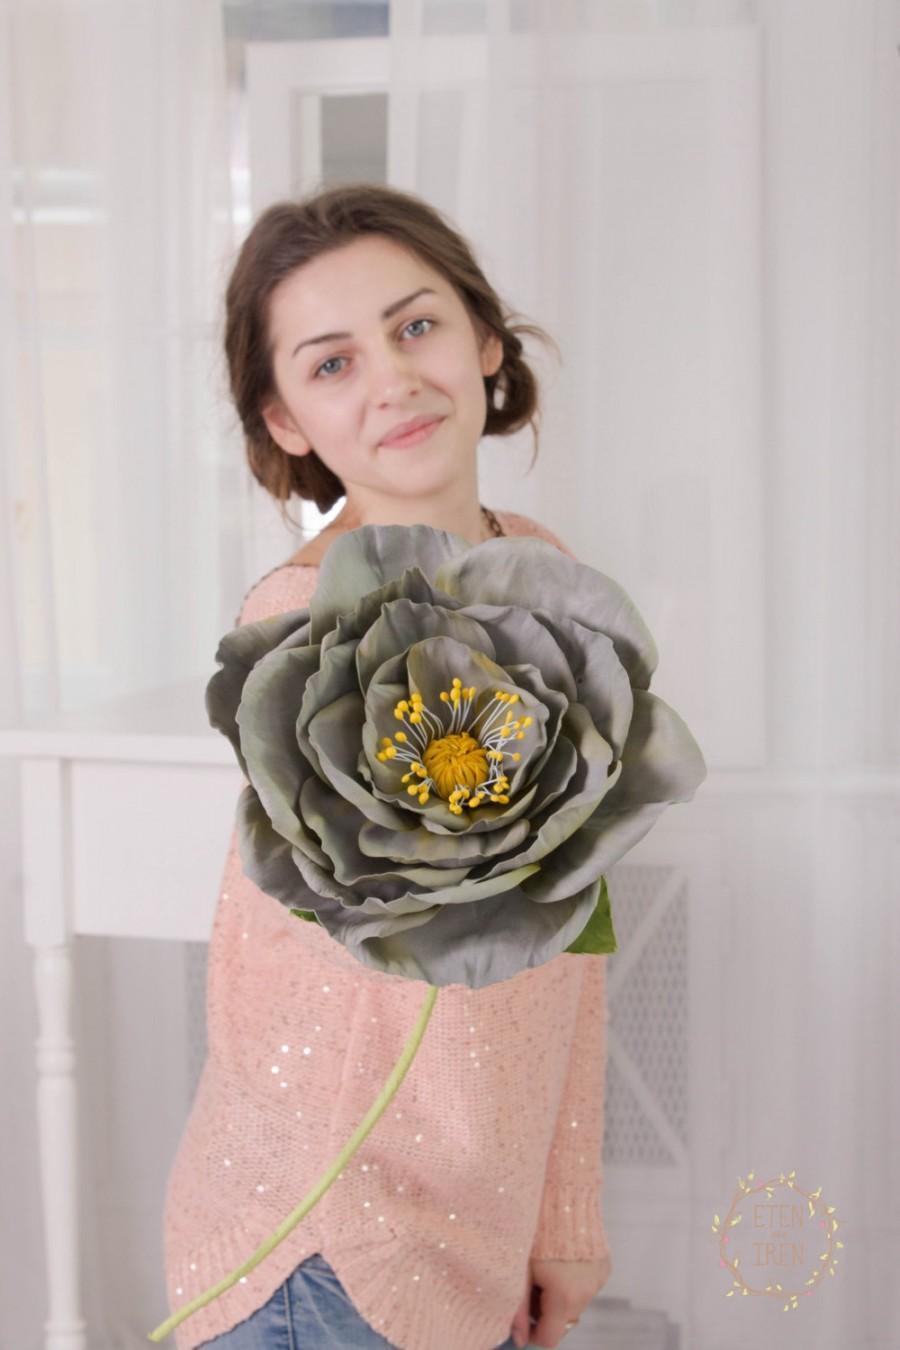 big grey rose flower decor wedding floral bouquet artificial flower house decor home decoration bridal birthday gifts